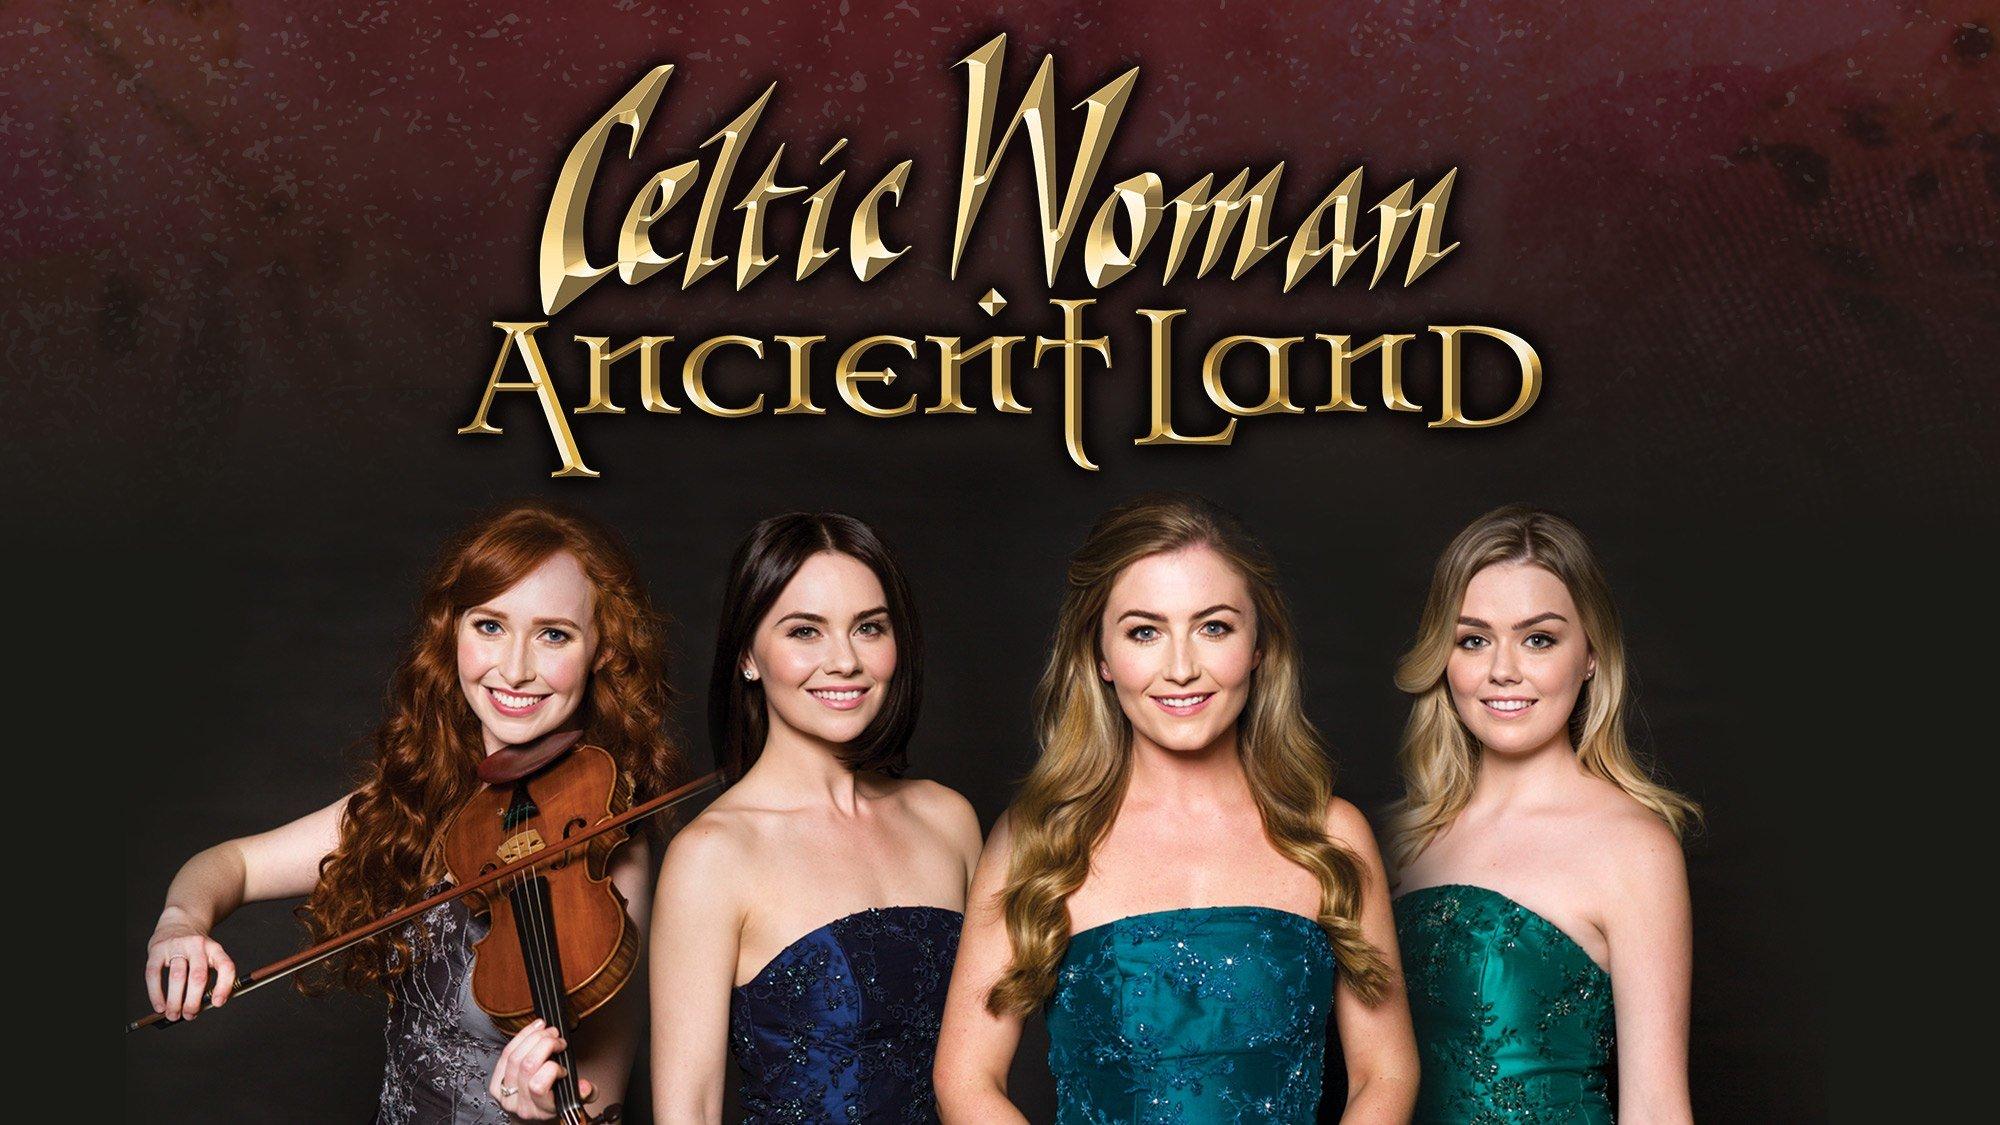 Celtic Women Ppac 4 2 19 Foxy Travel